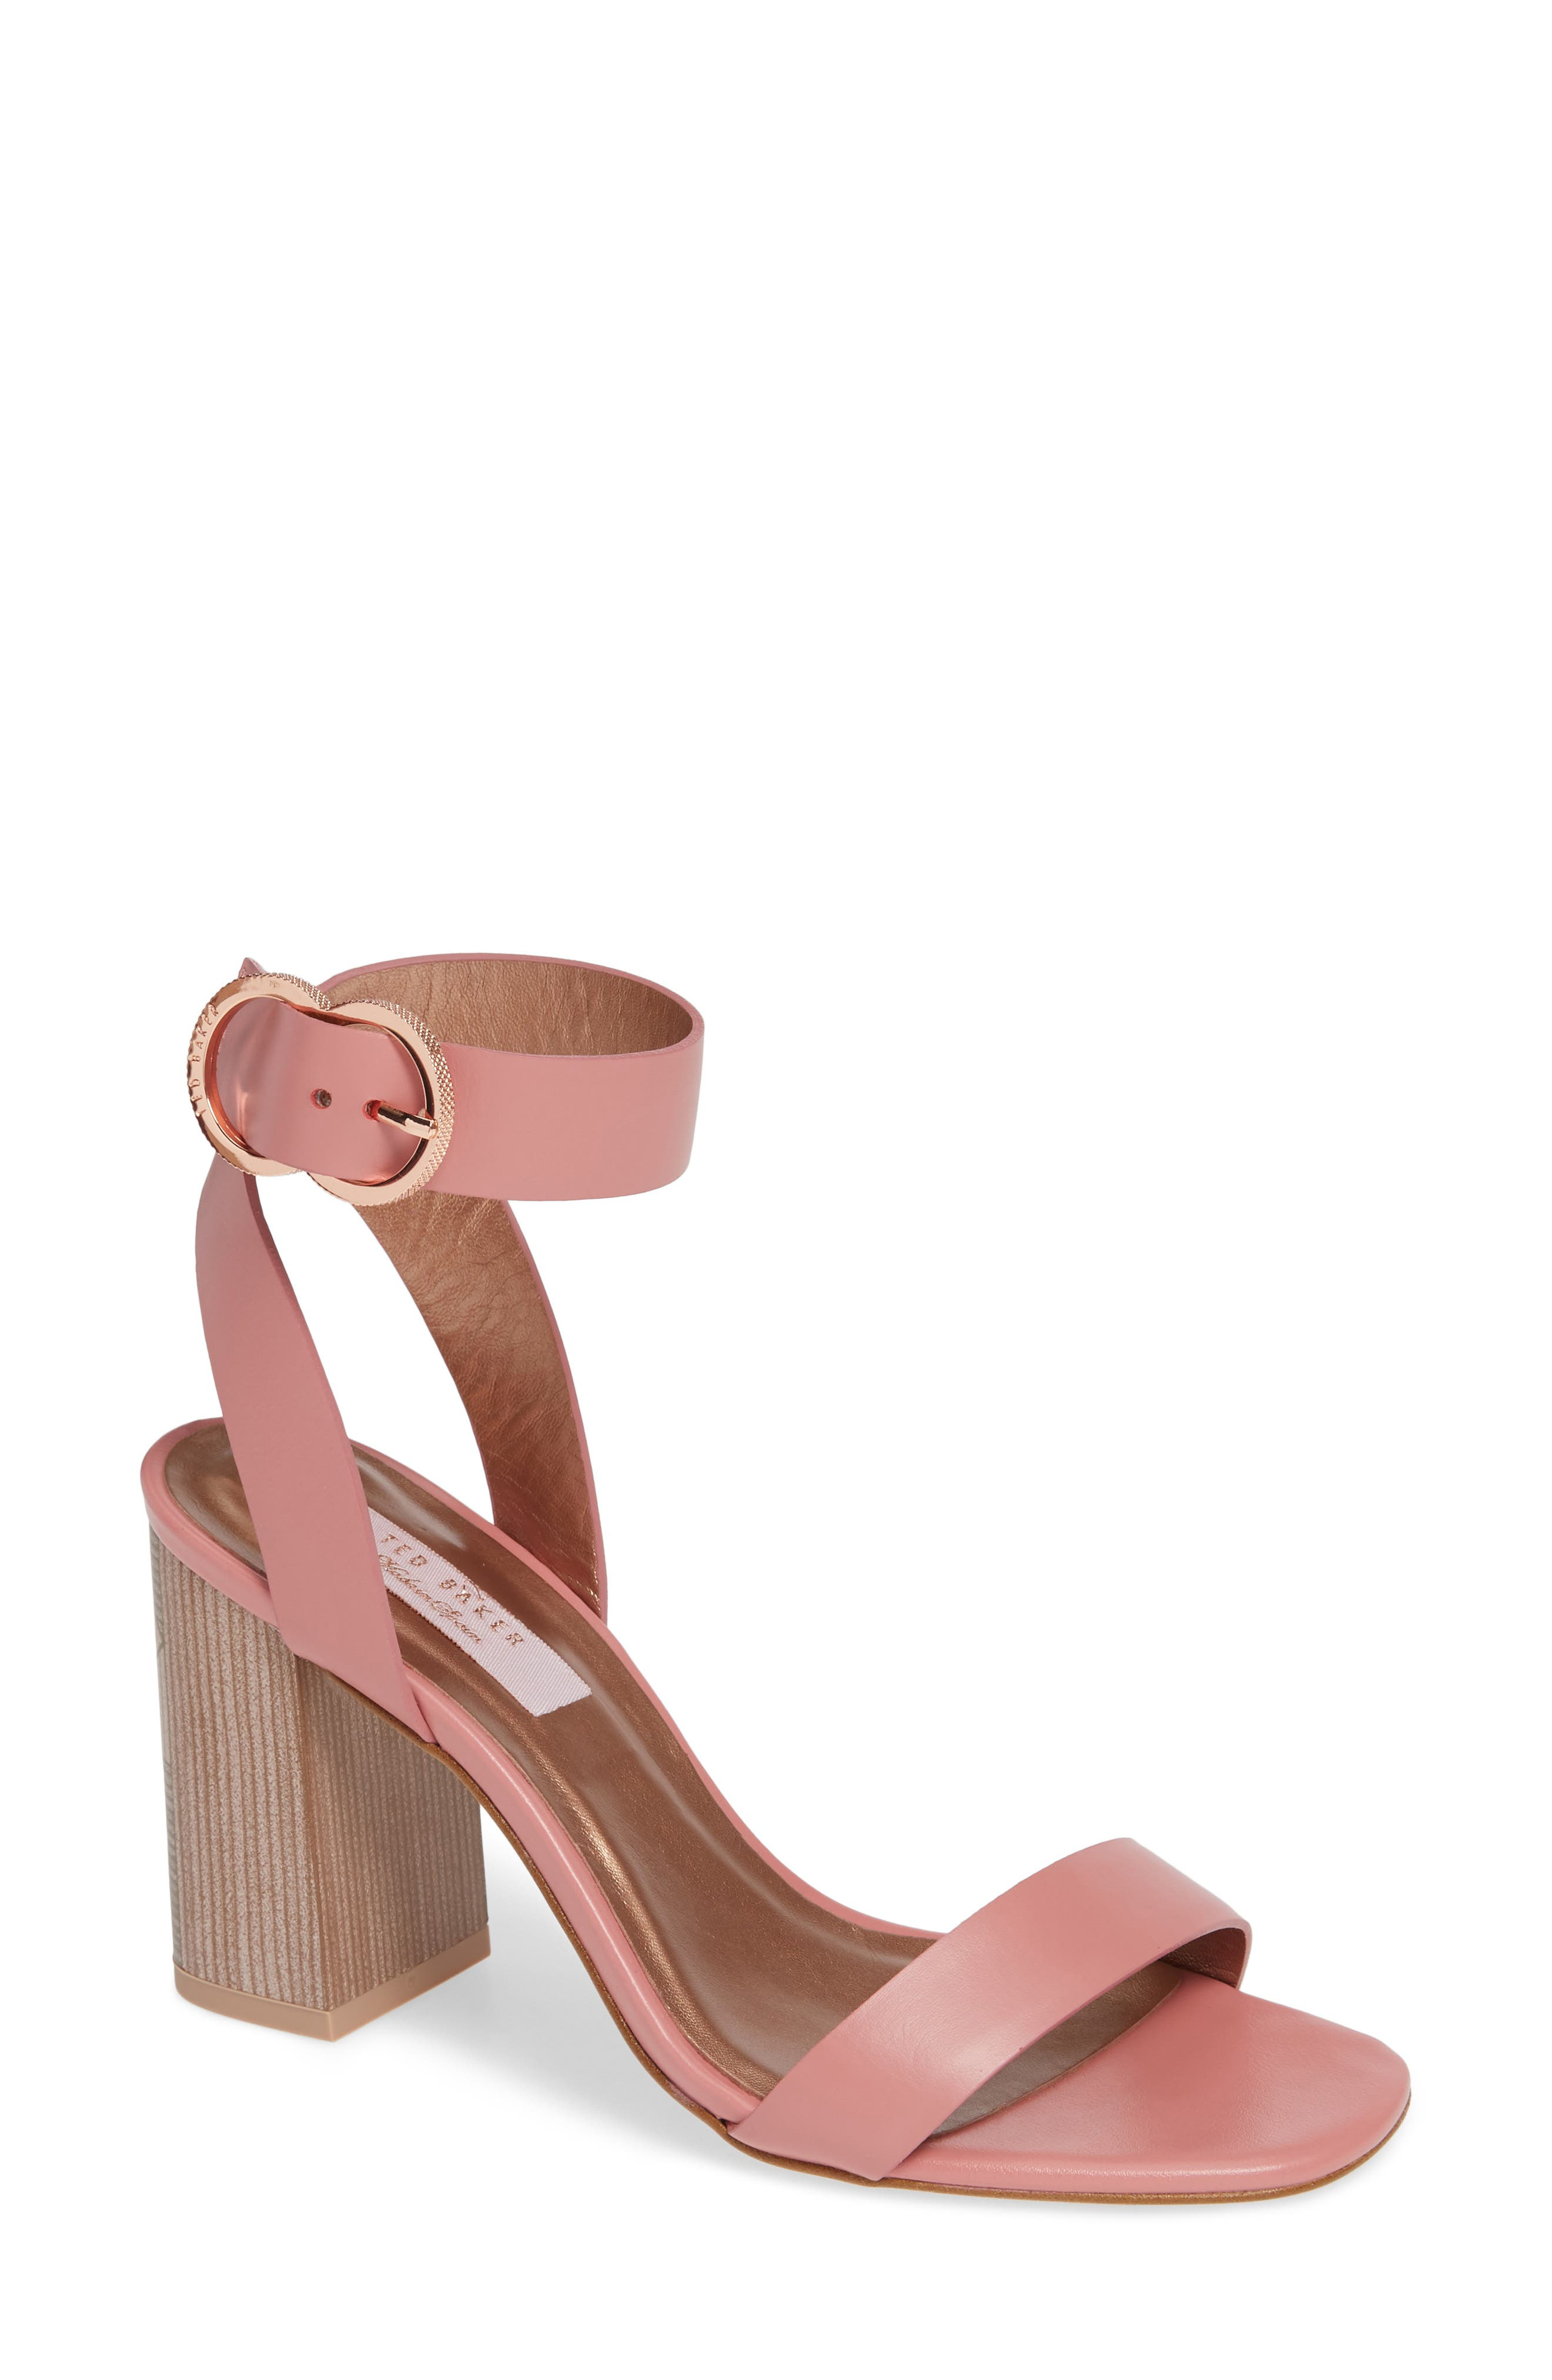 Vallama Block Heel Sandal,                             Main thumbnail 1, color,                             PINK LEATHER